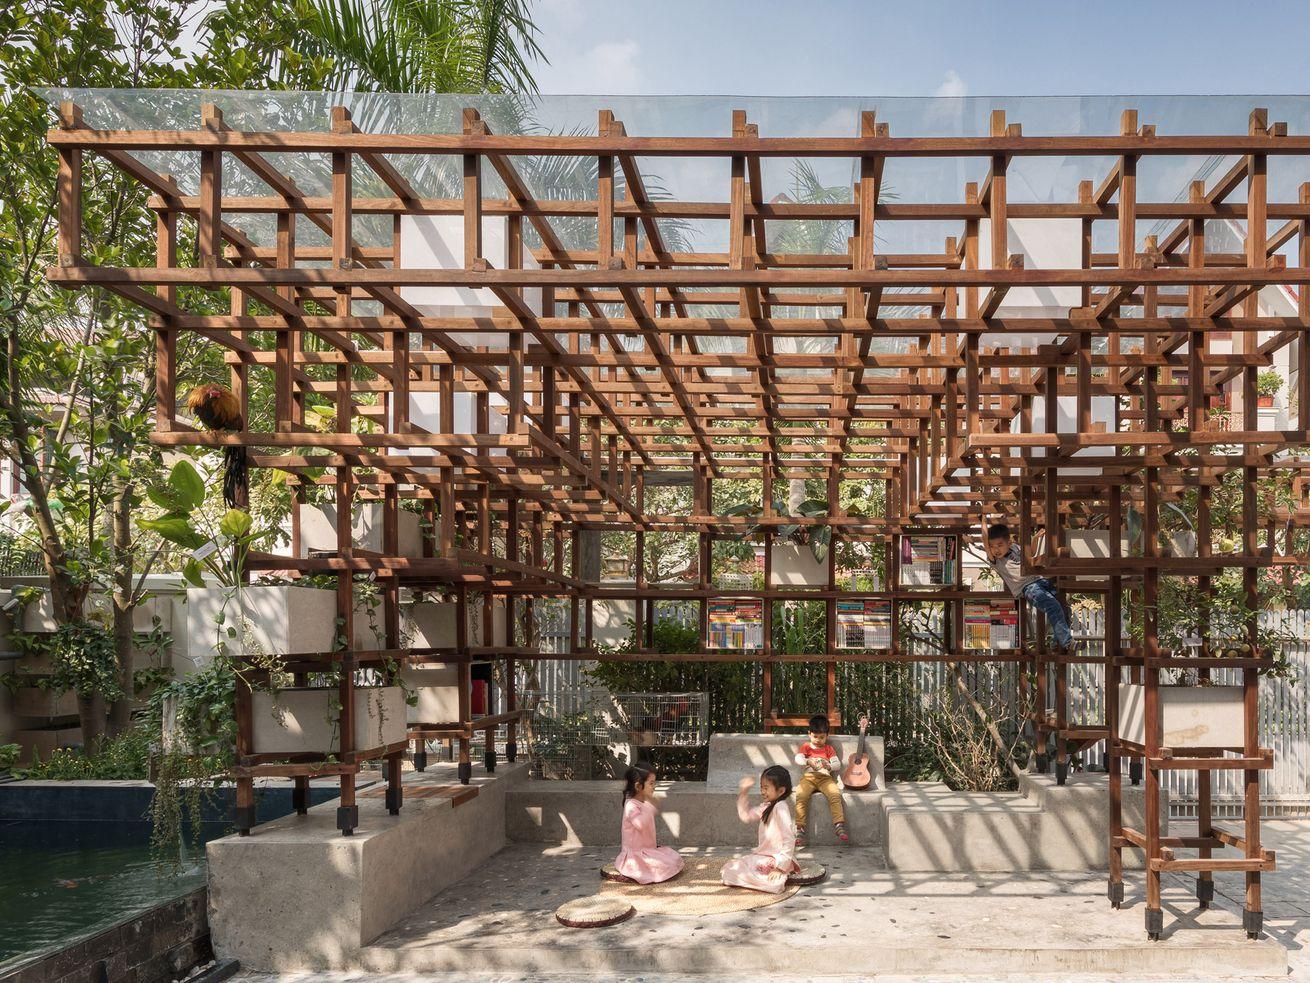 Jungle gym library runs a mini ecosystem to teach kids about urban farming